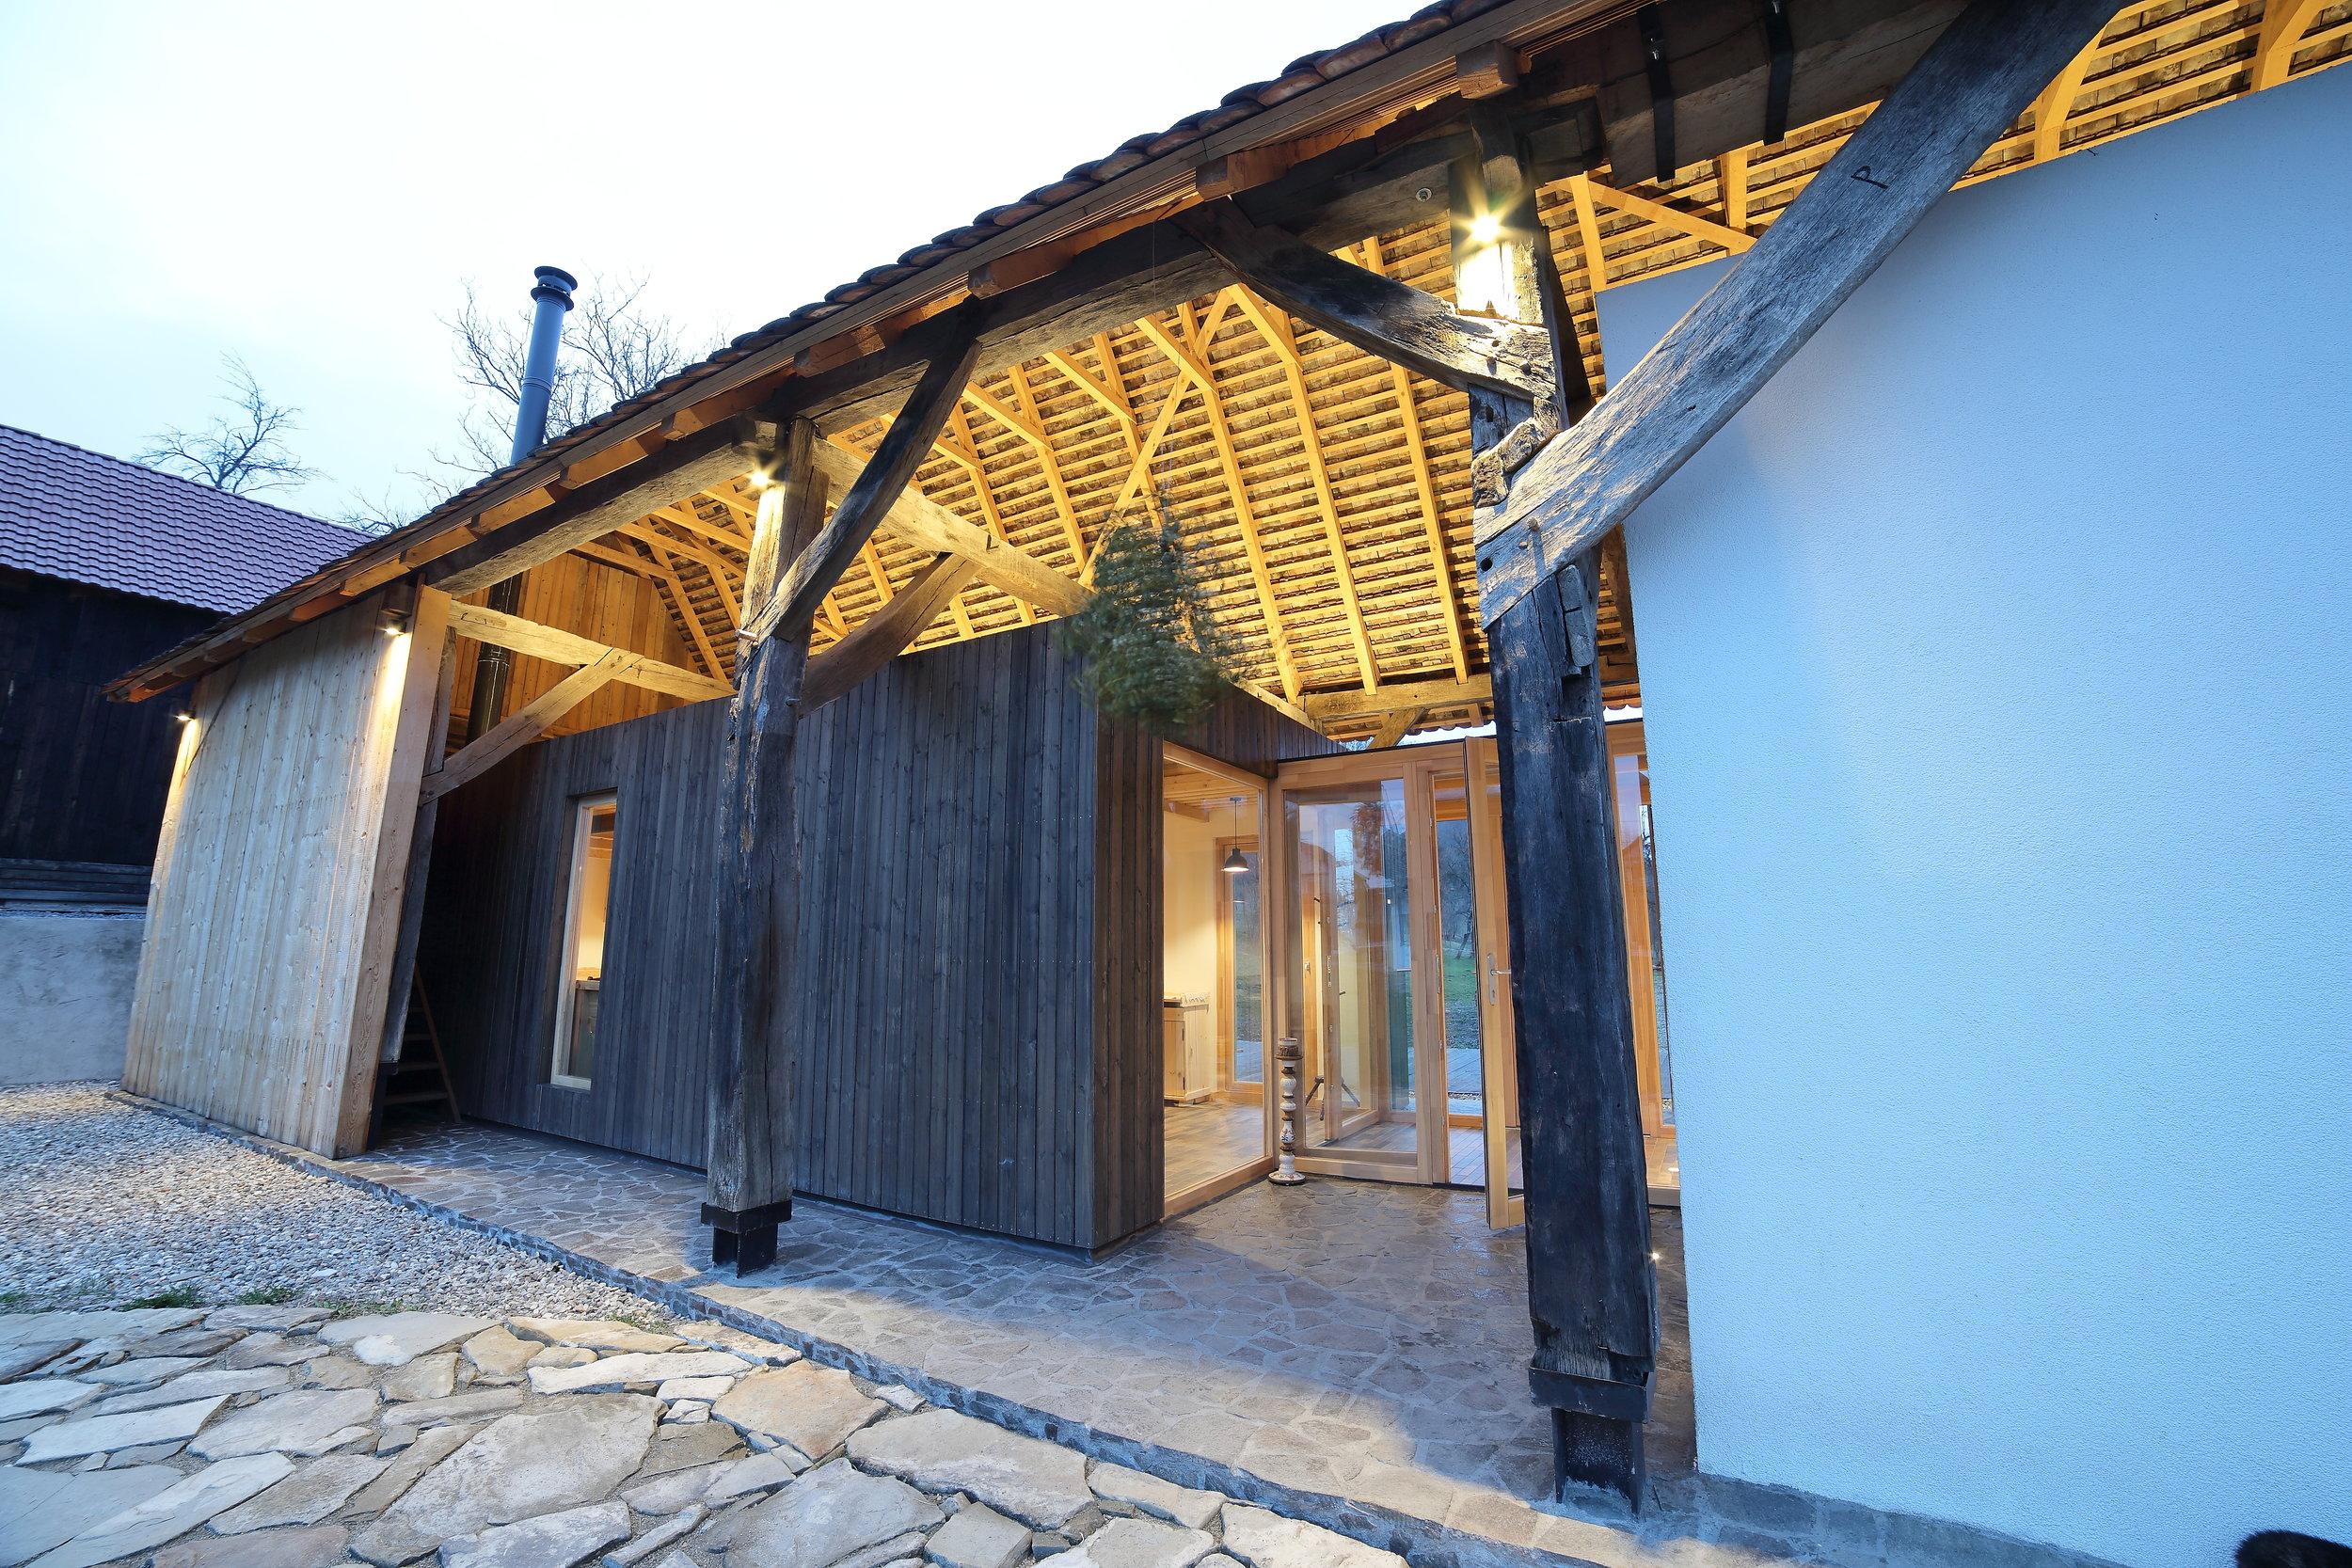 The magical barn -